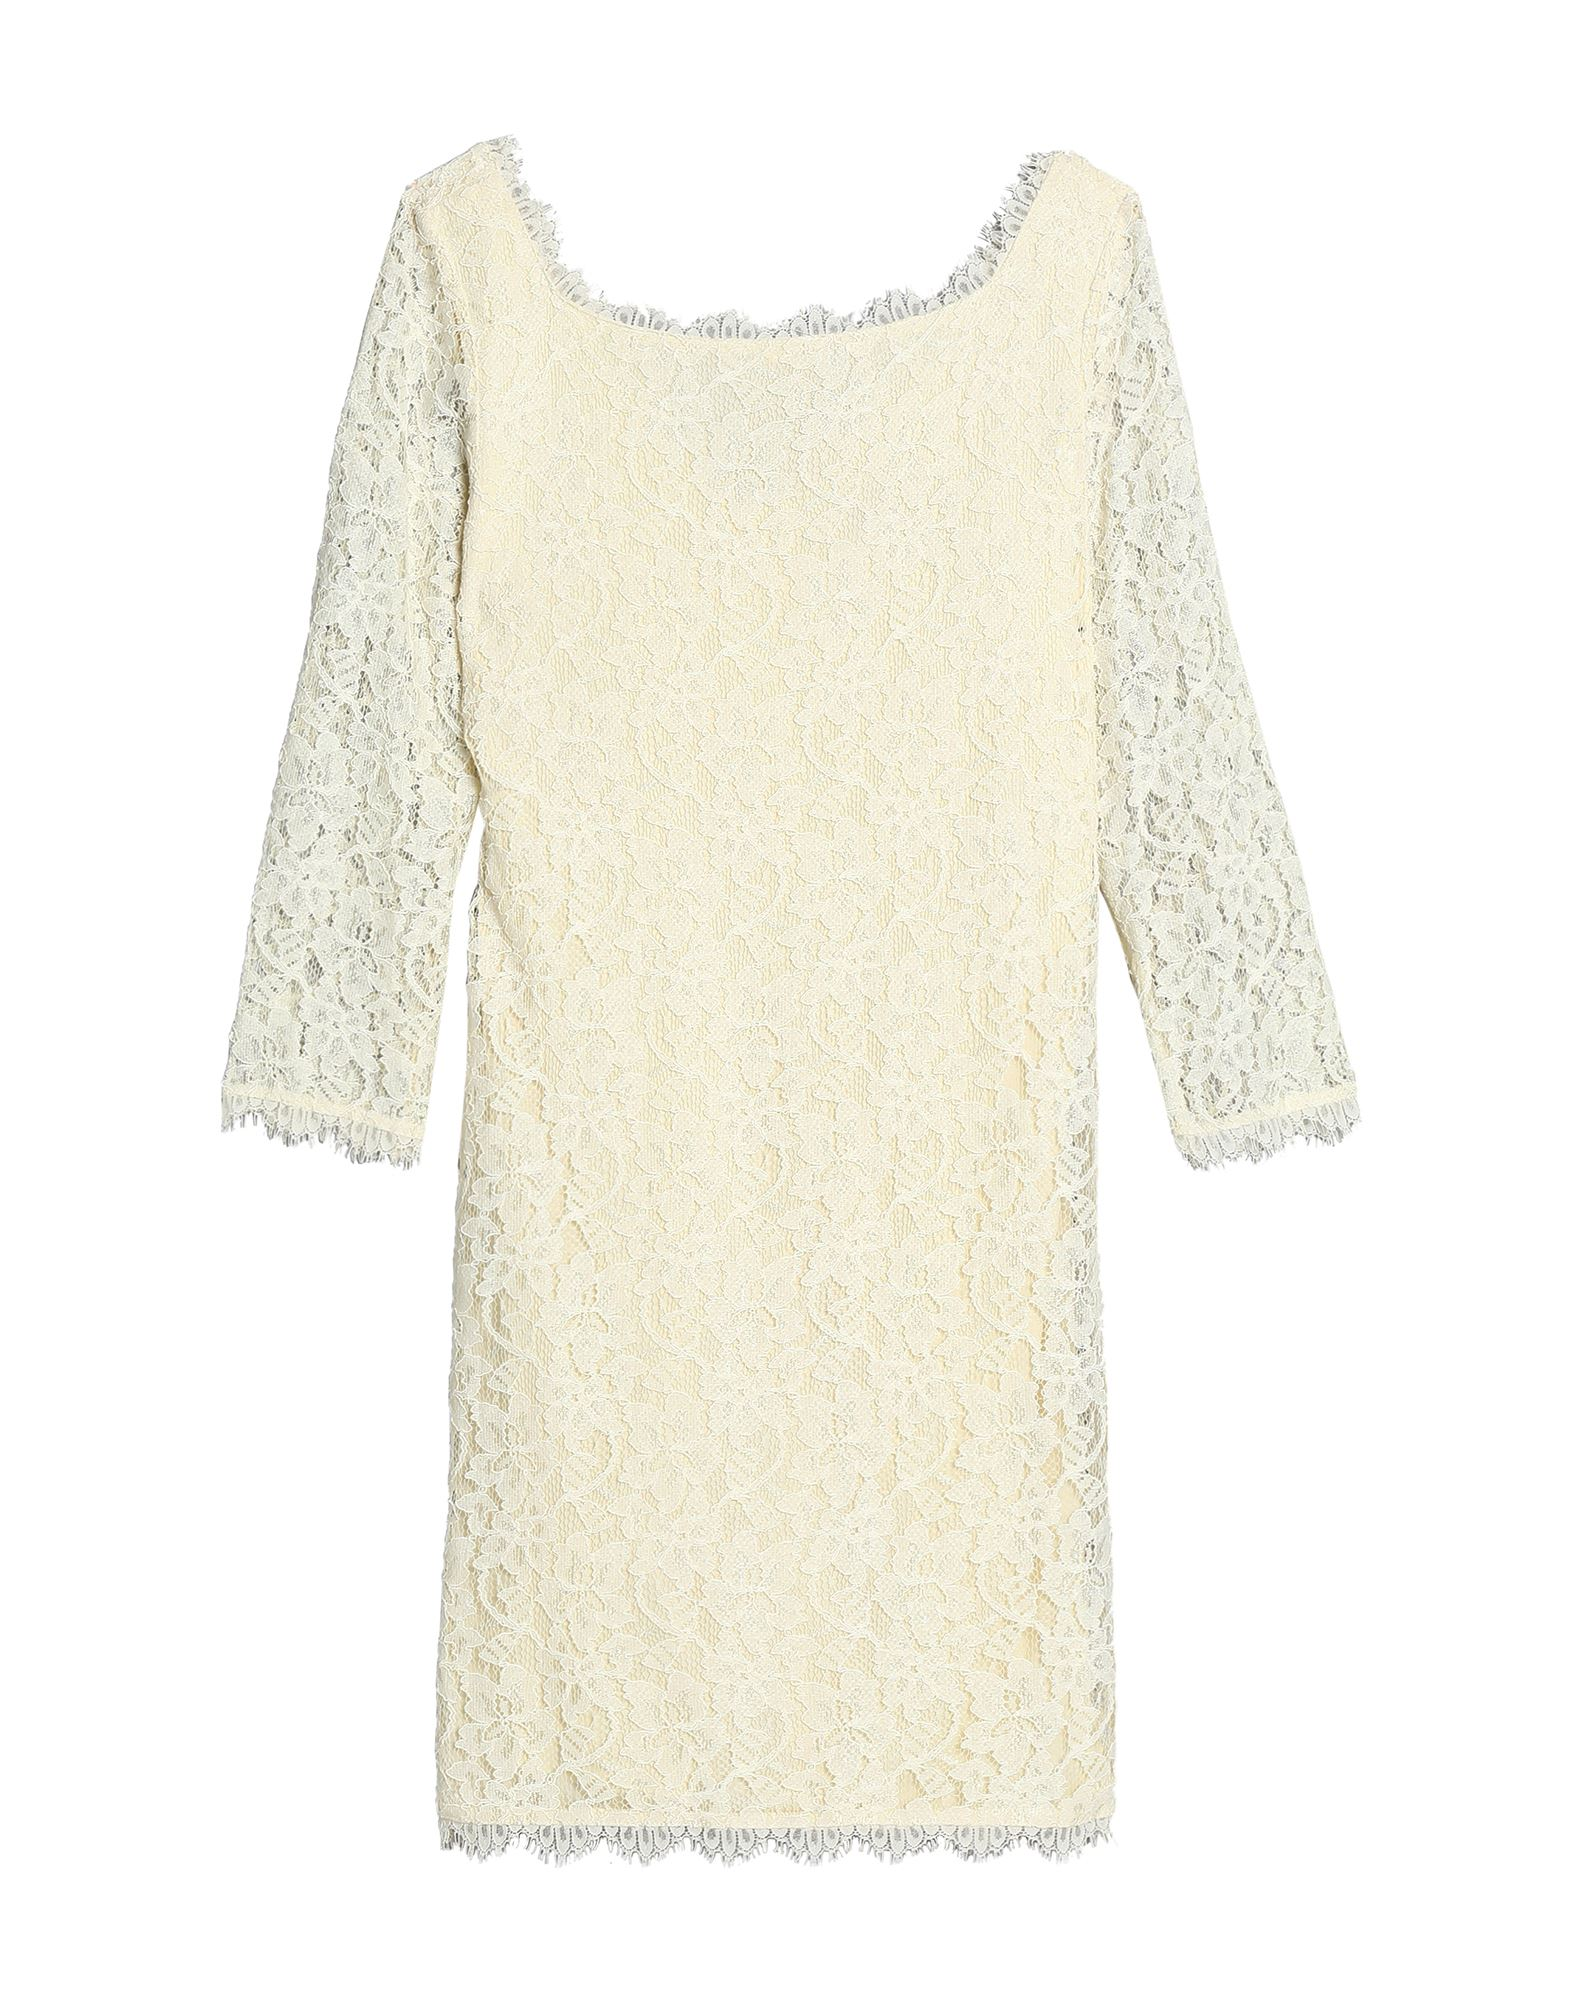 Vestito Corto Diane Von Furstenberg damen - 34698830HB